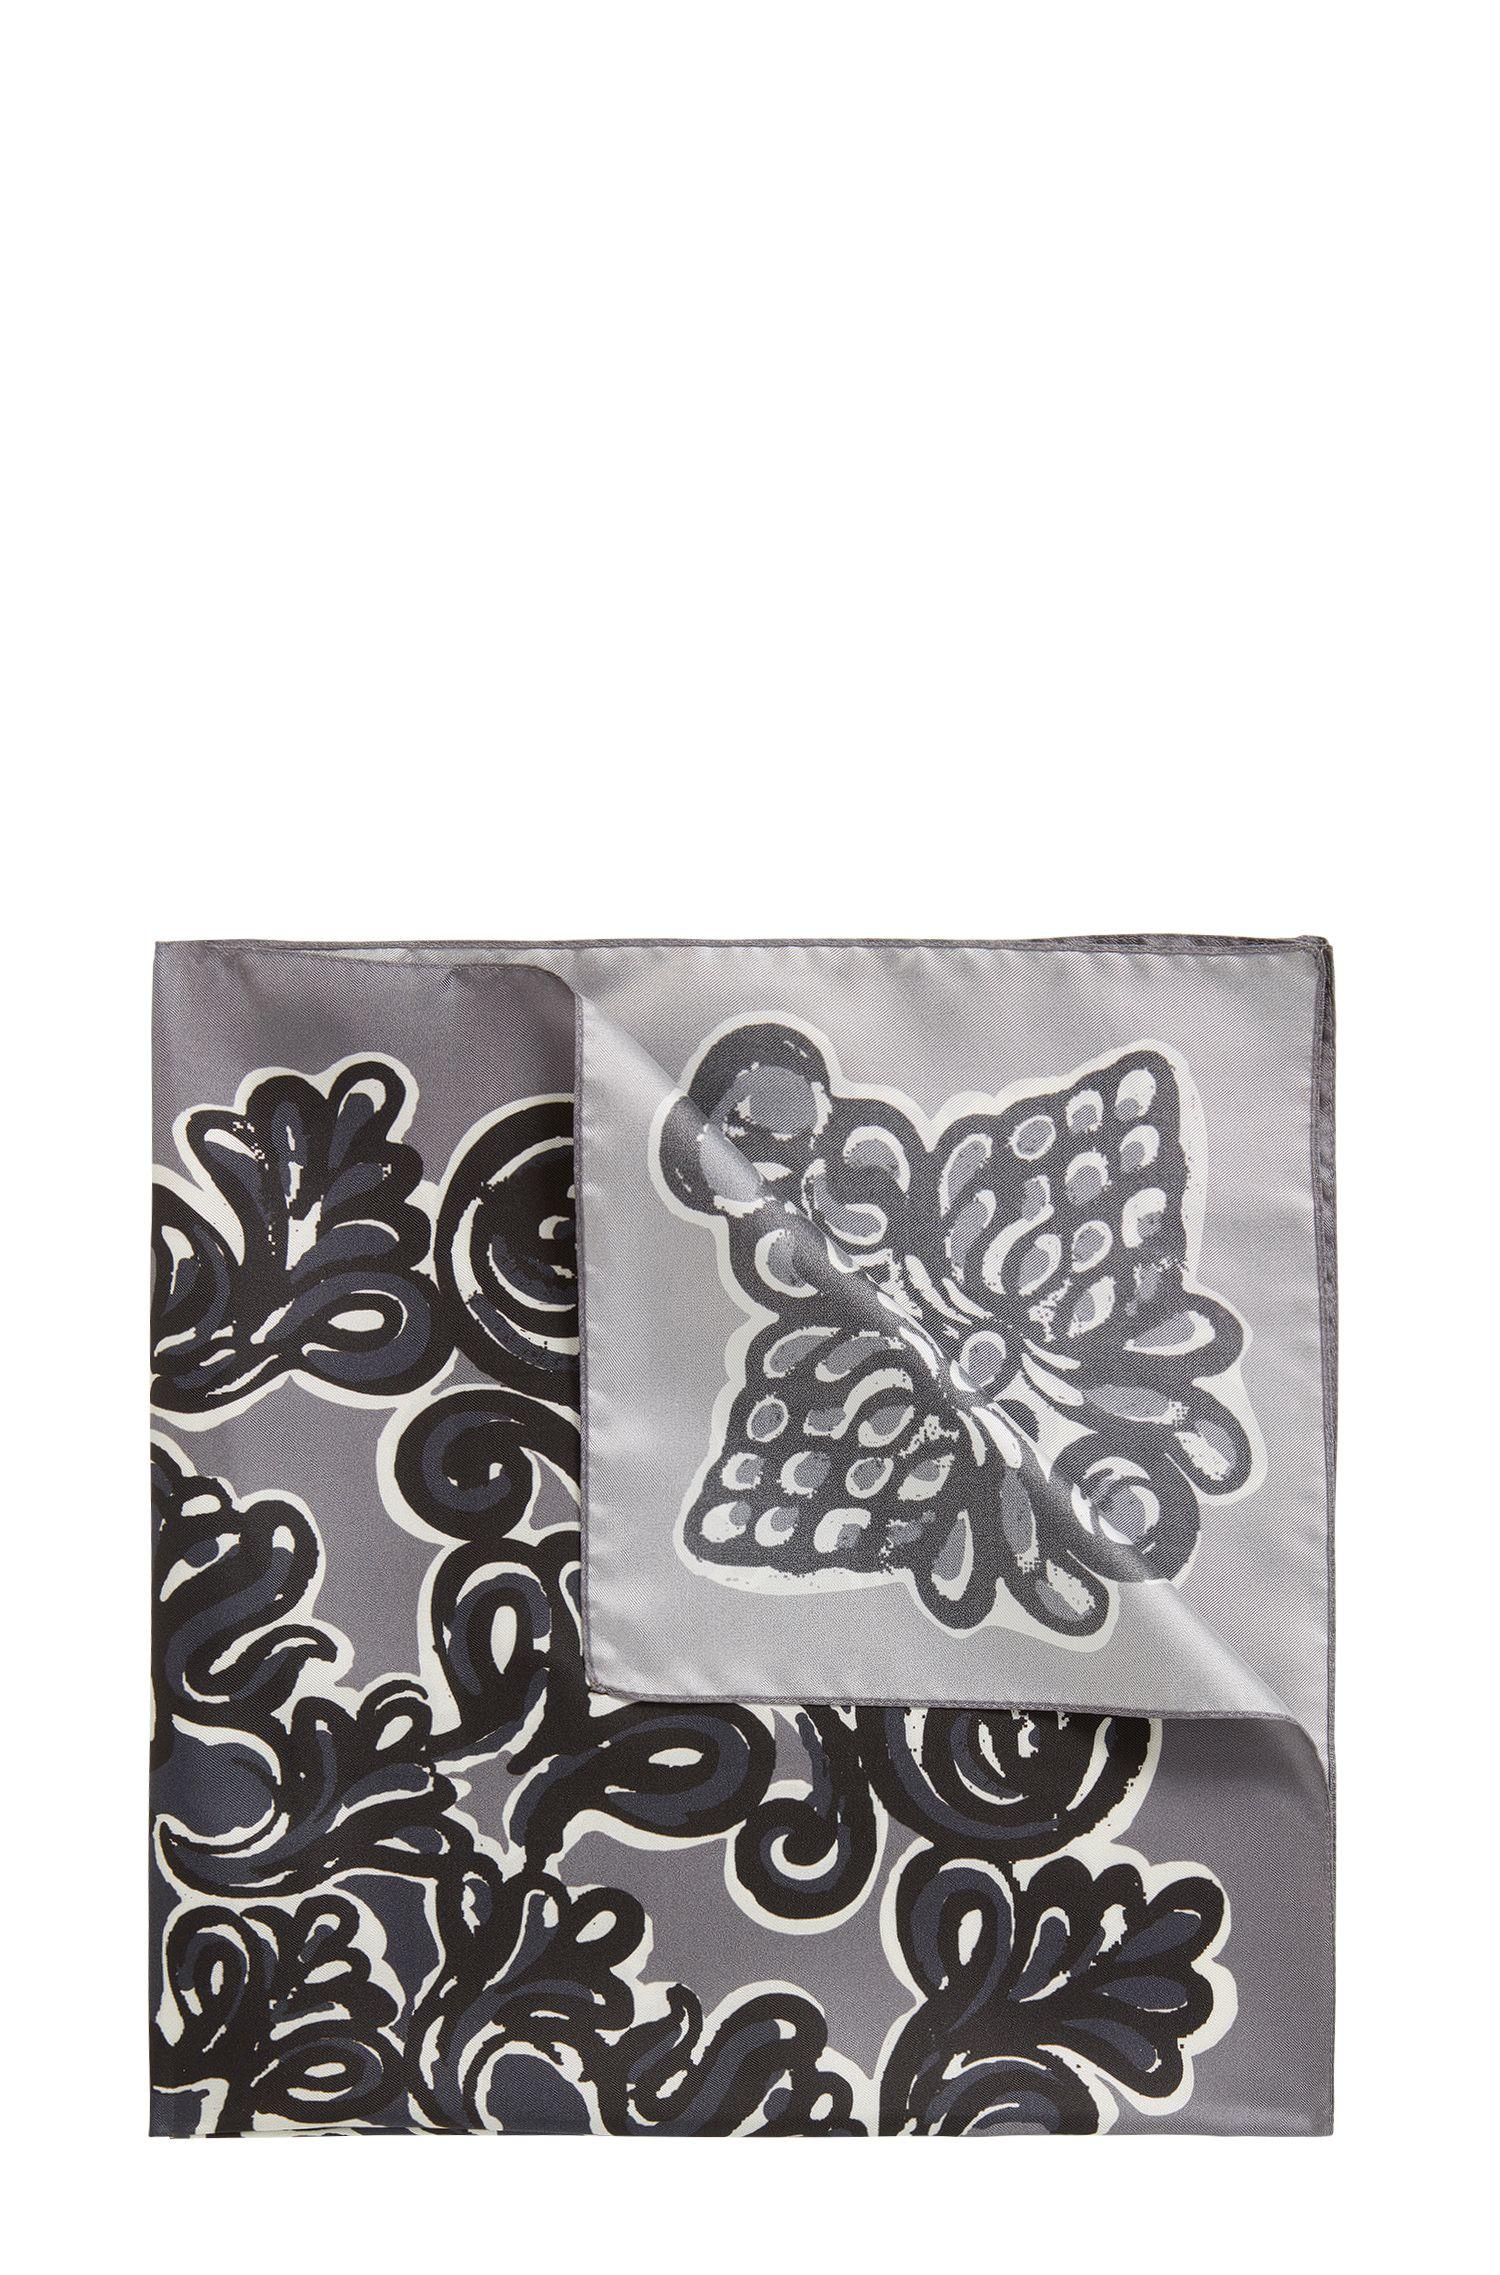 Pañuelo estampado en seda